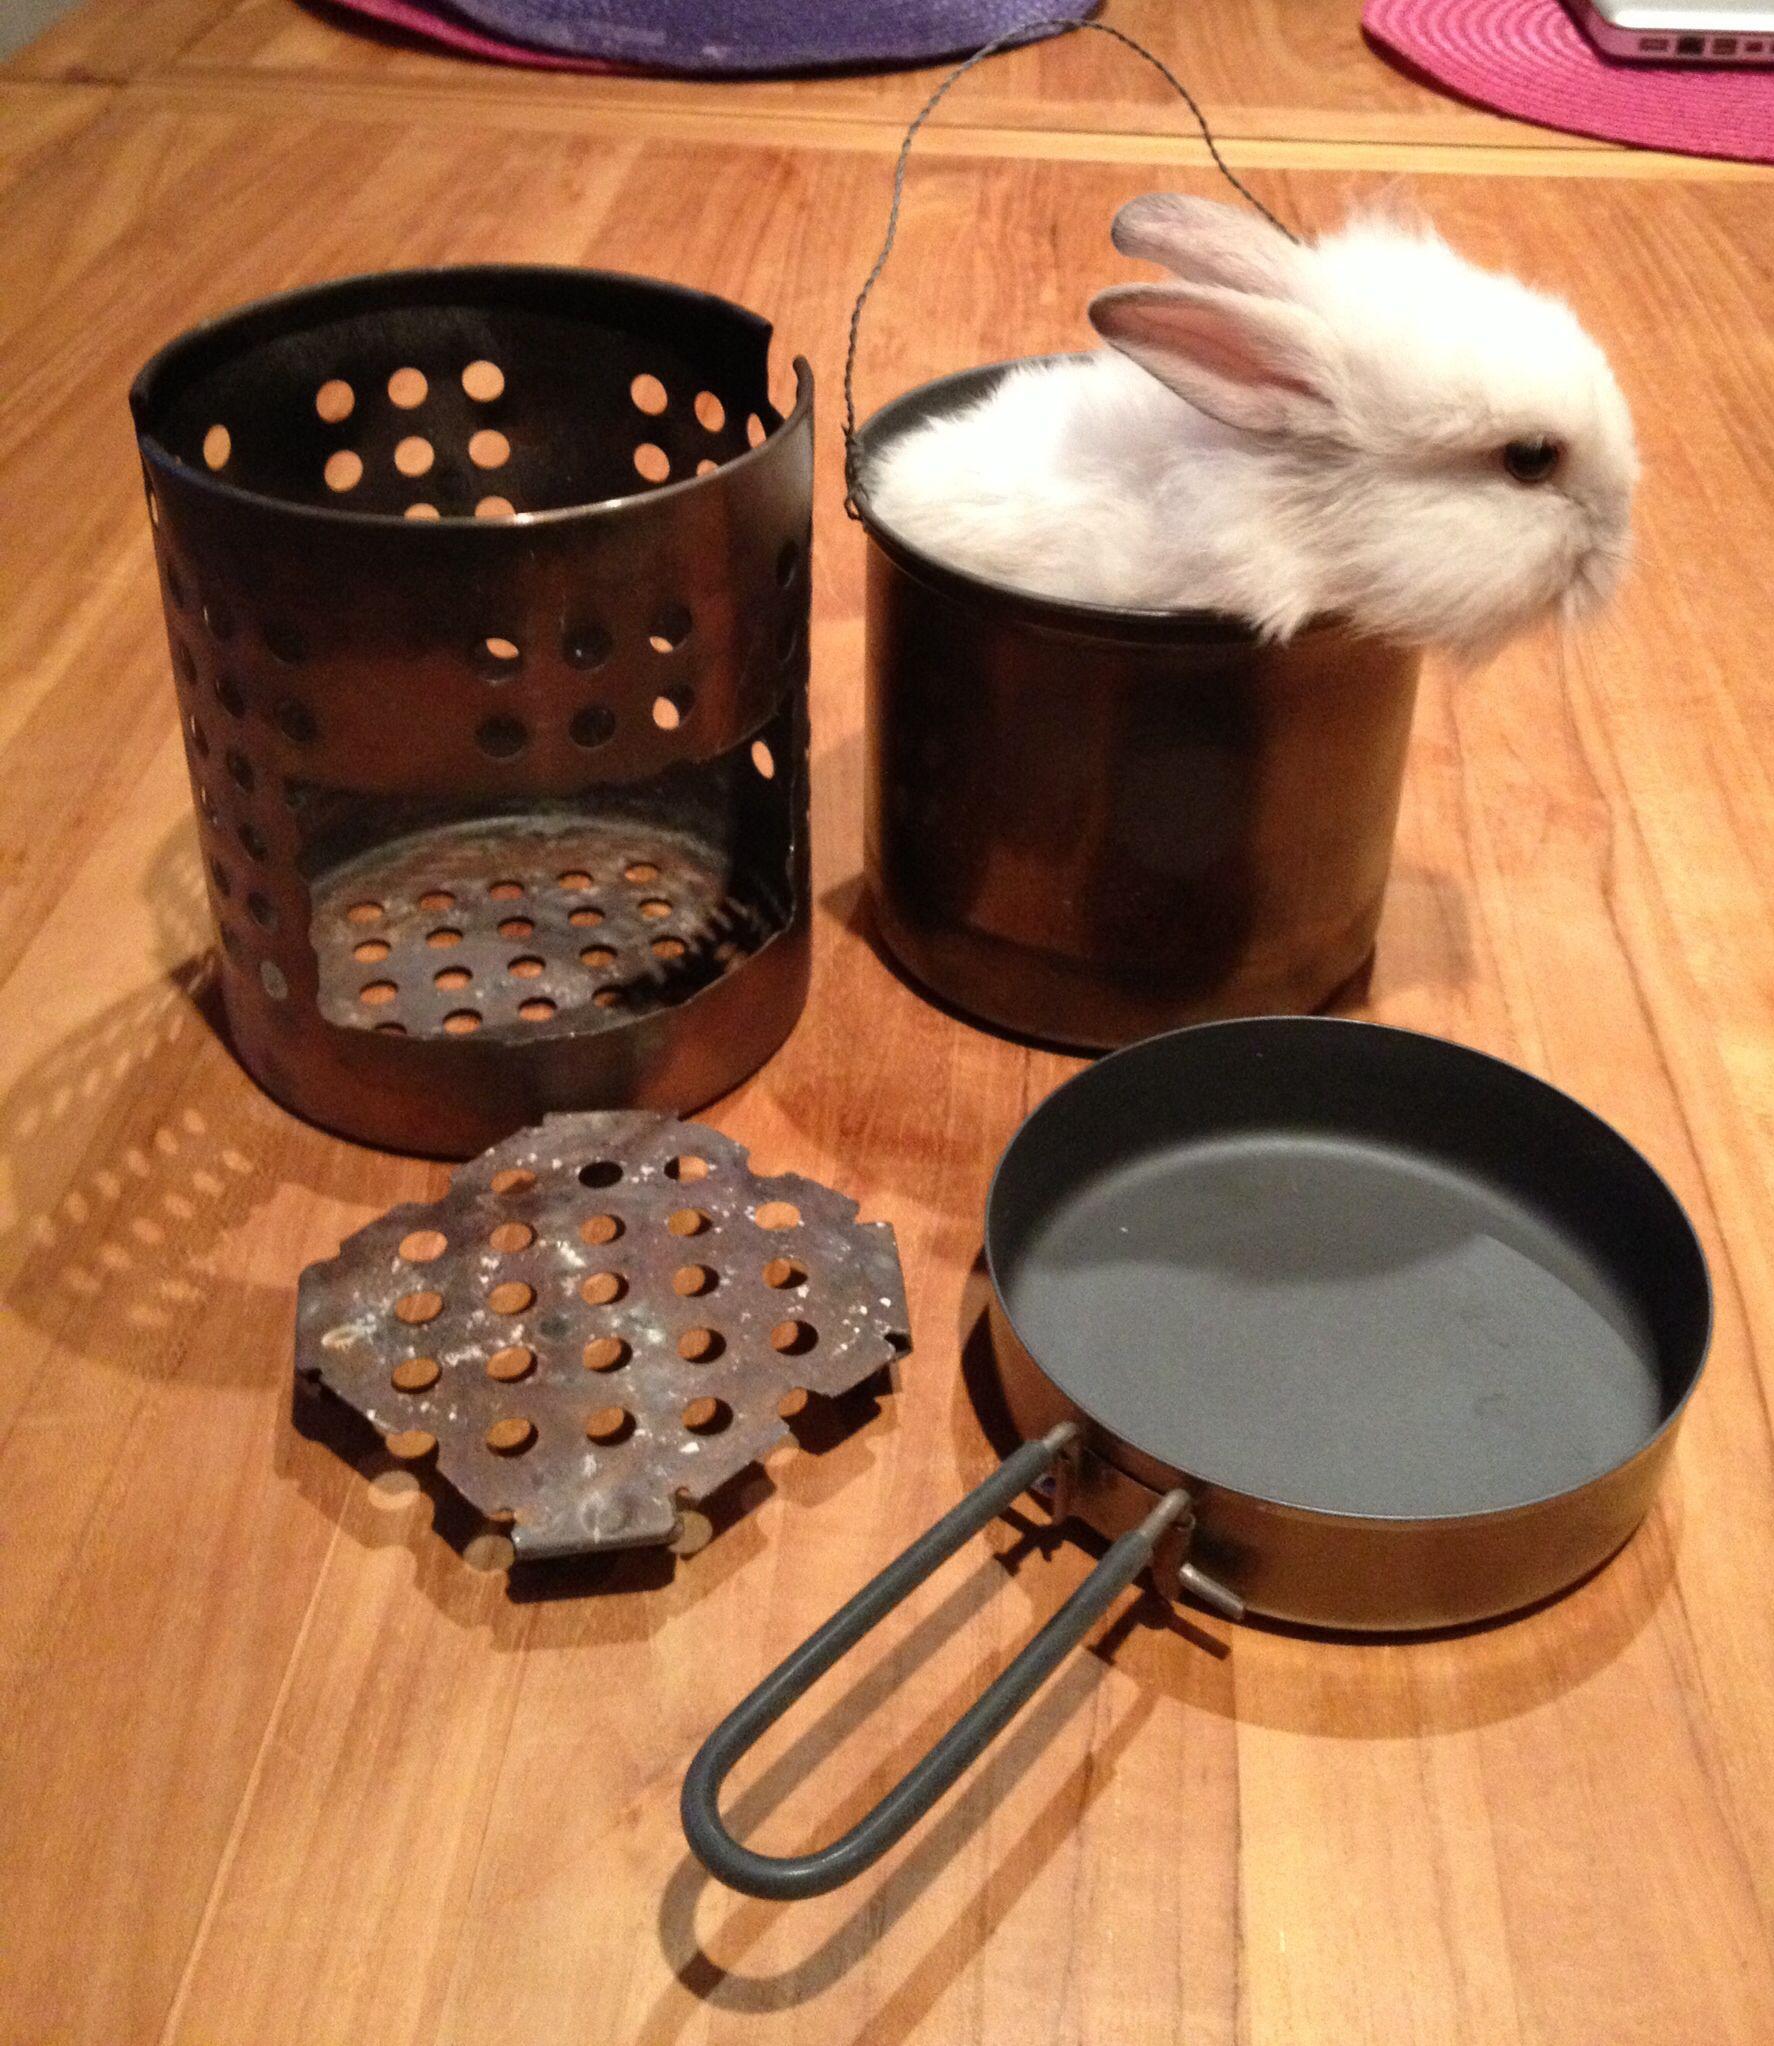 Homemade hobostove, with ikea utensilholder. Titanium pot fits ...